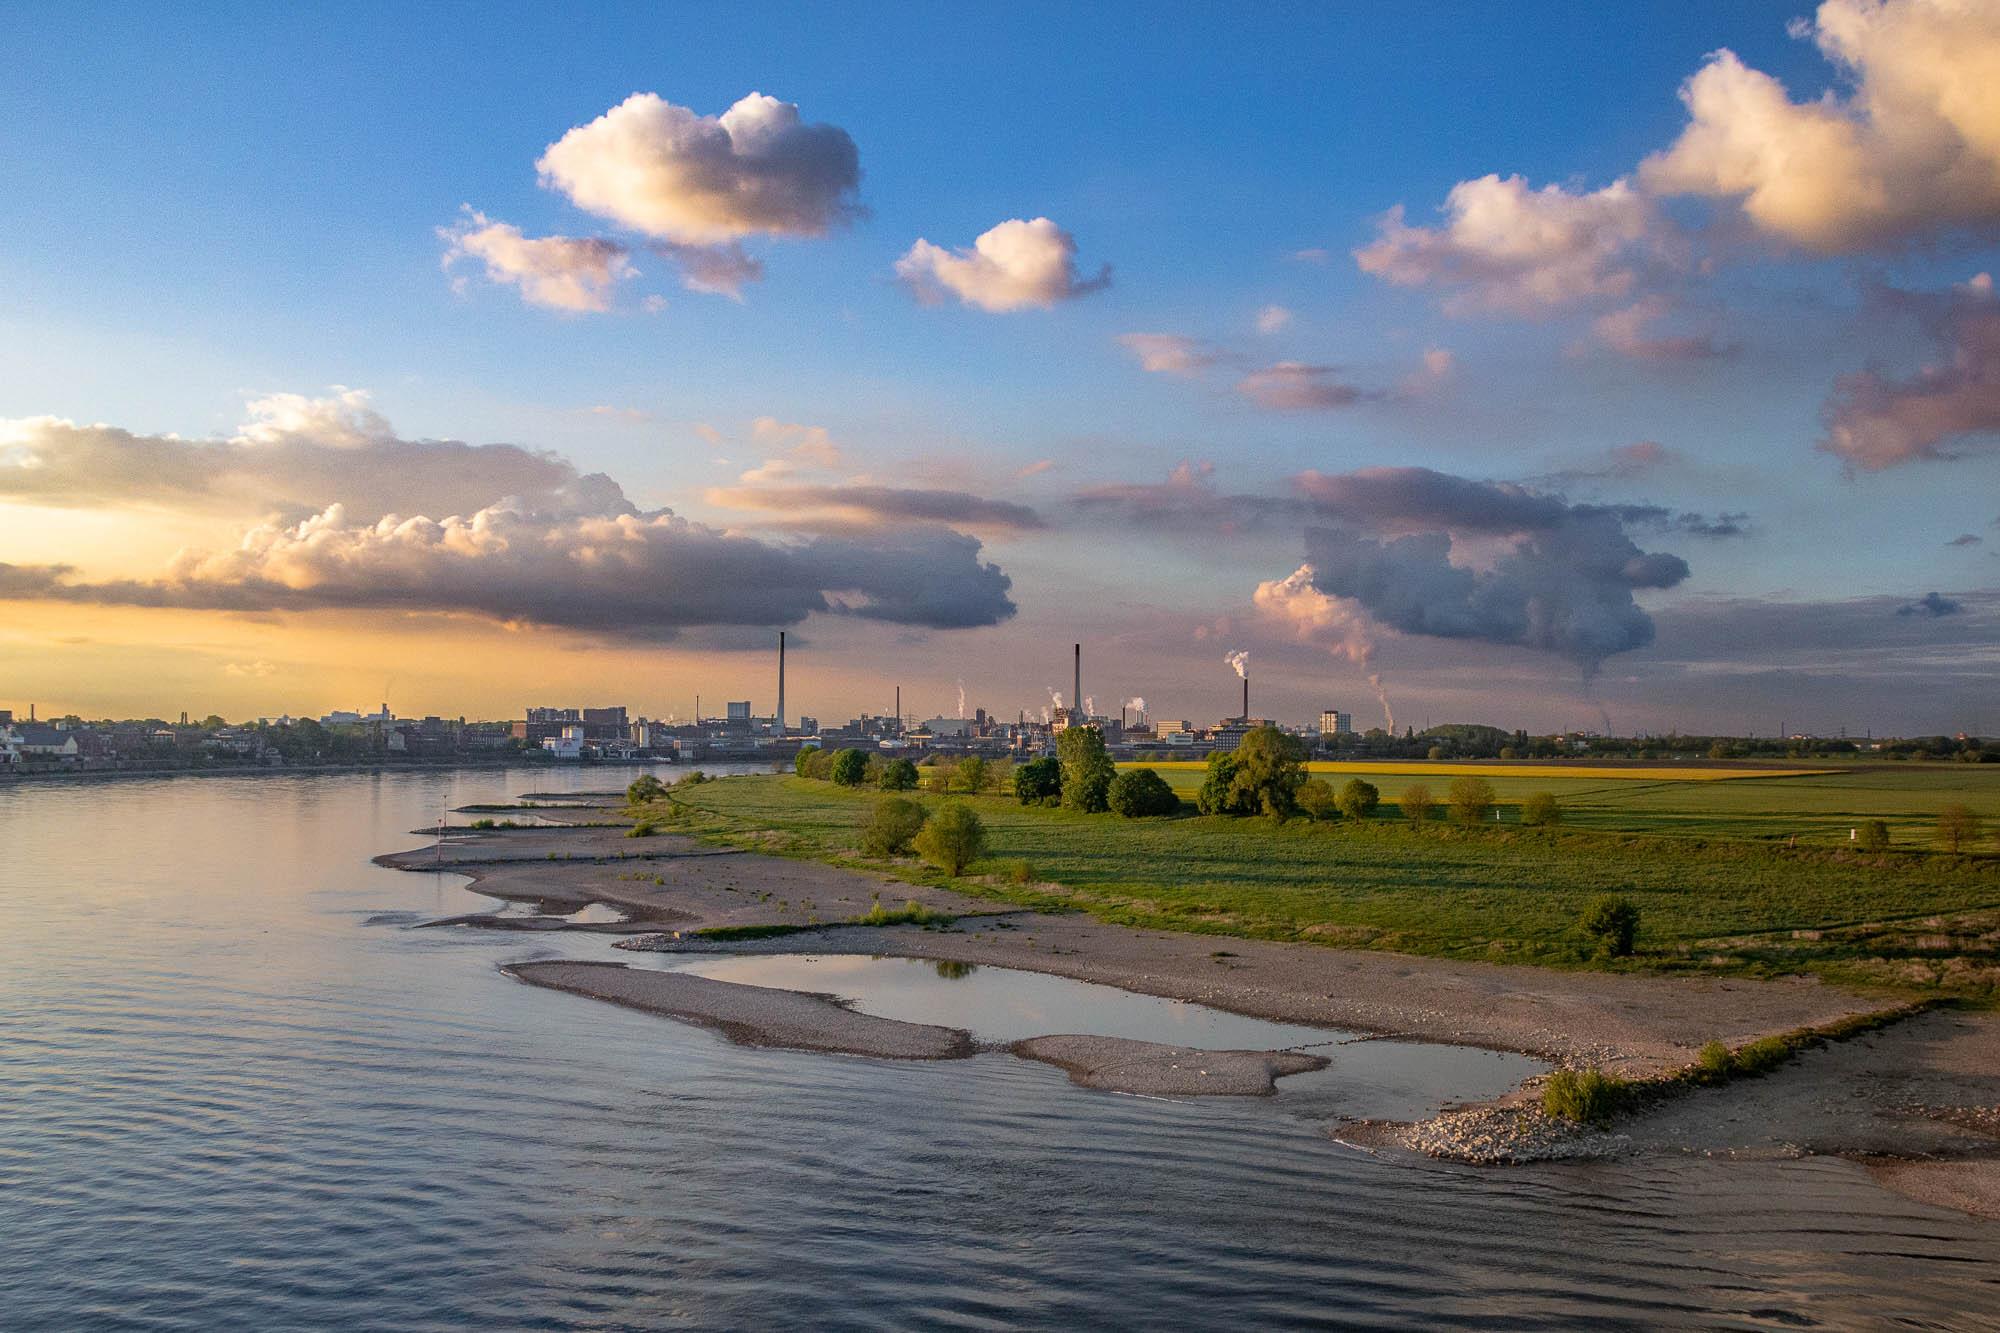 ollo / Abends am Rhein